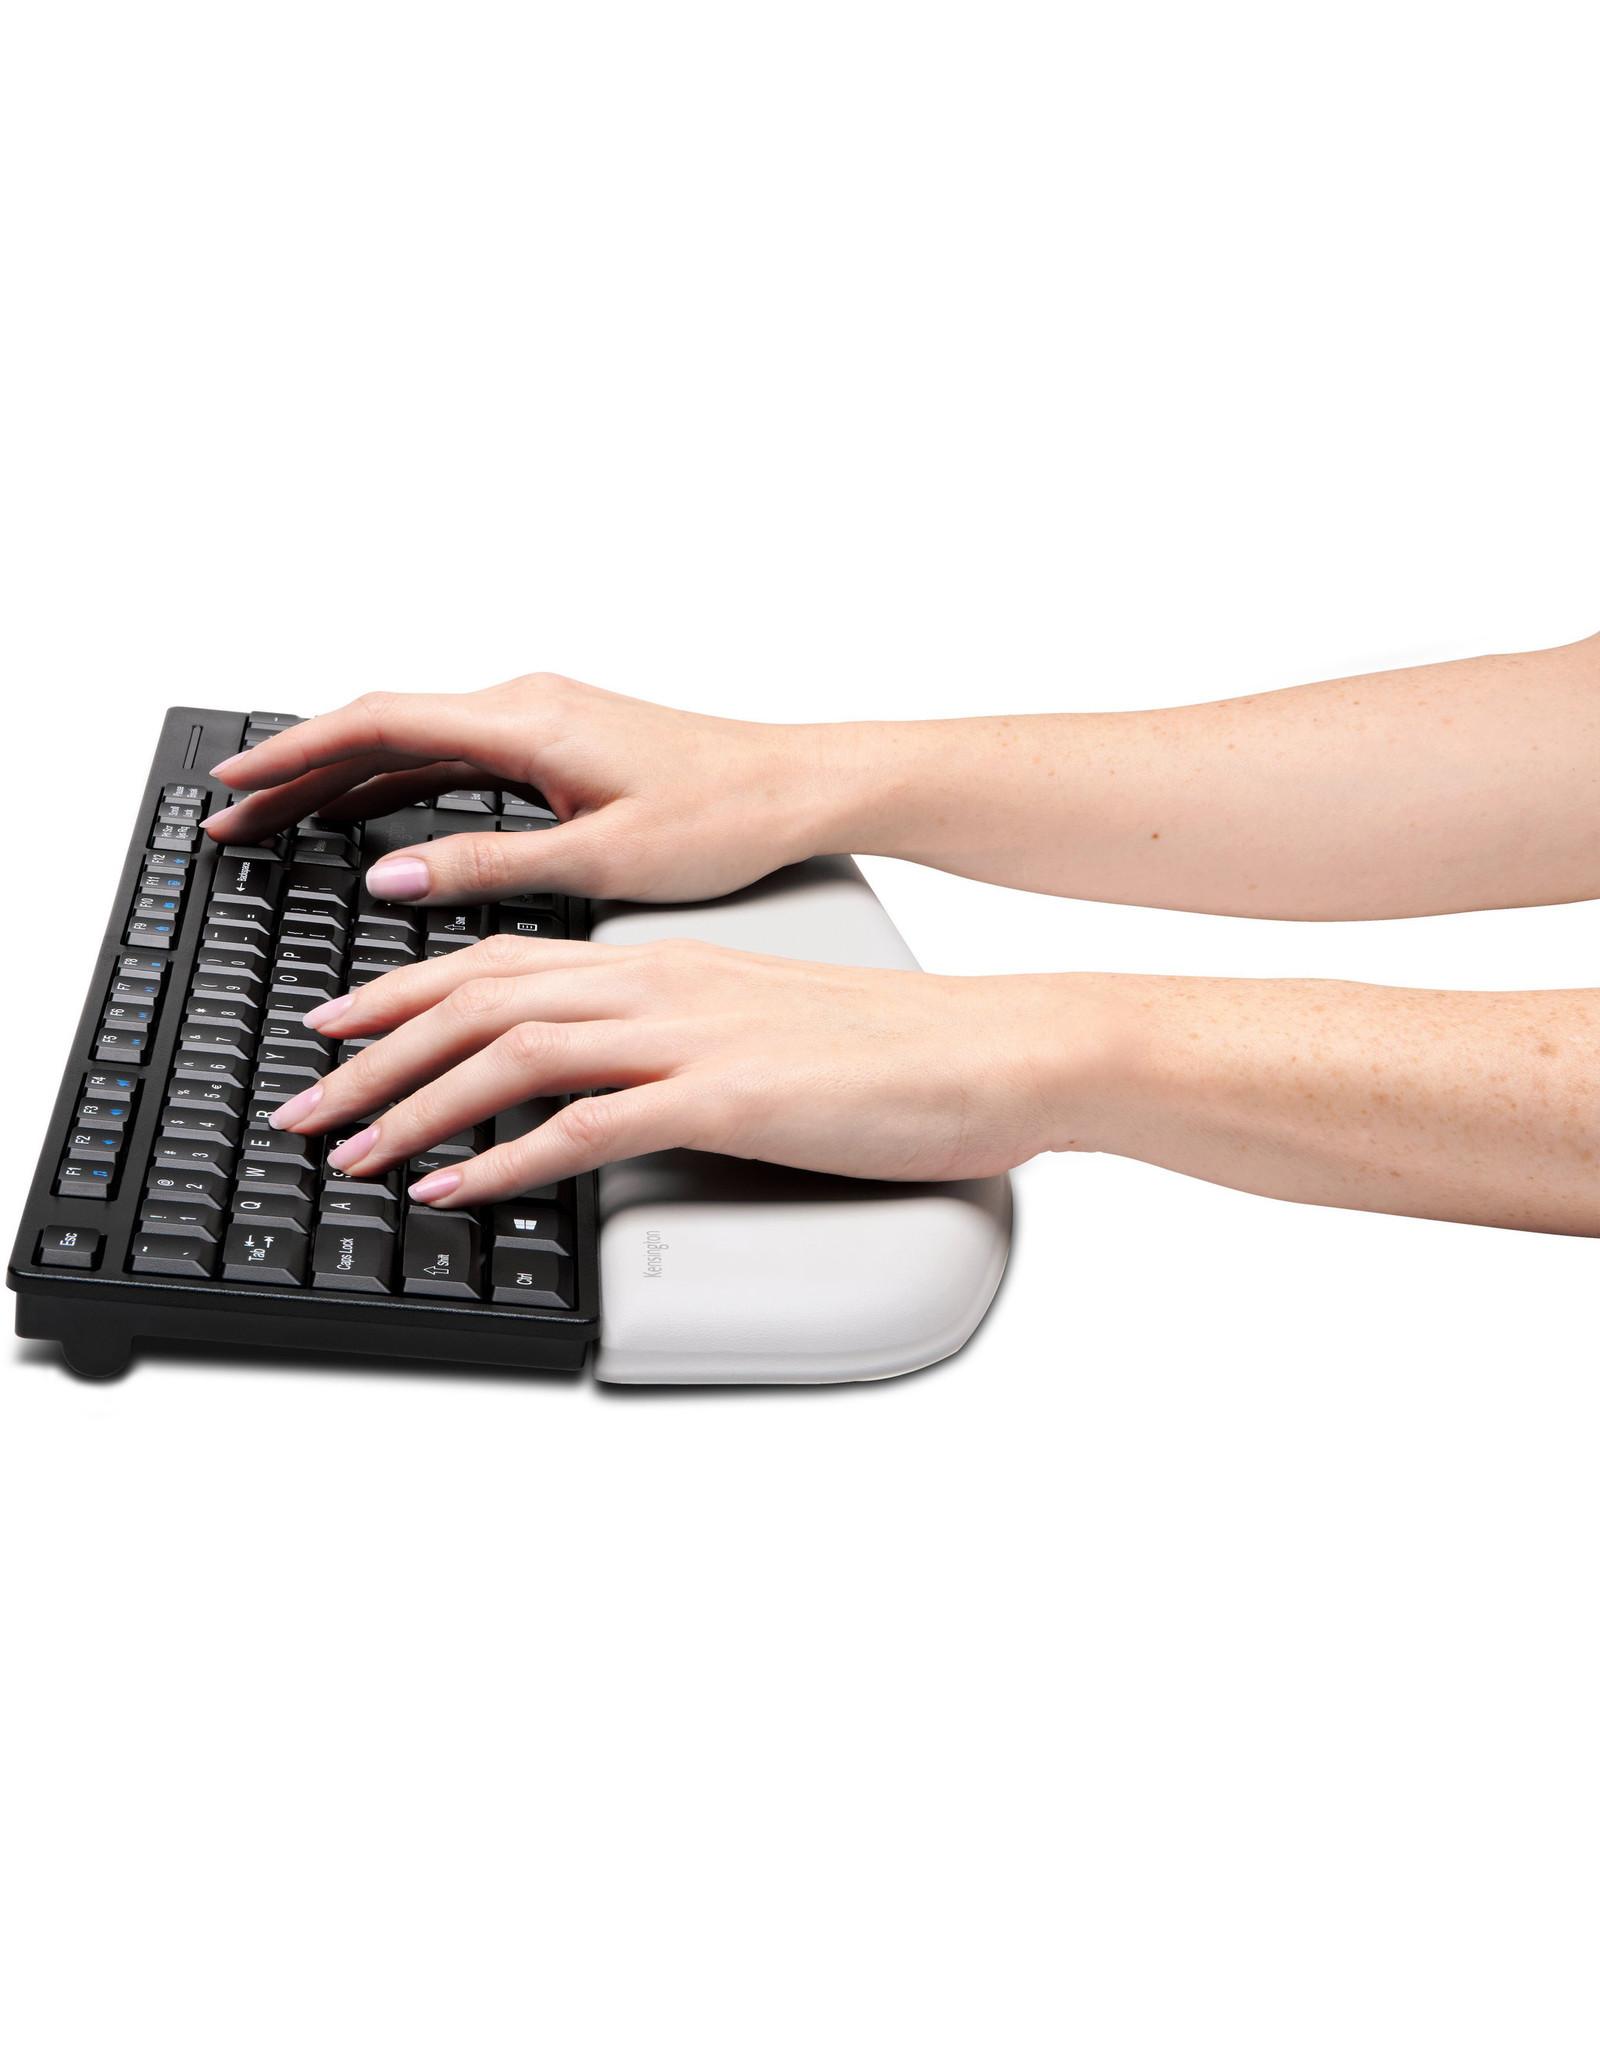 Kensington ErgoSoft™ Polssteun - standaard toetsenbord